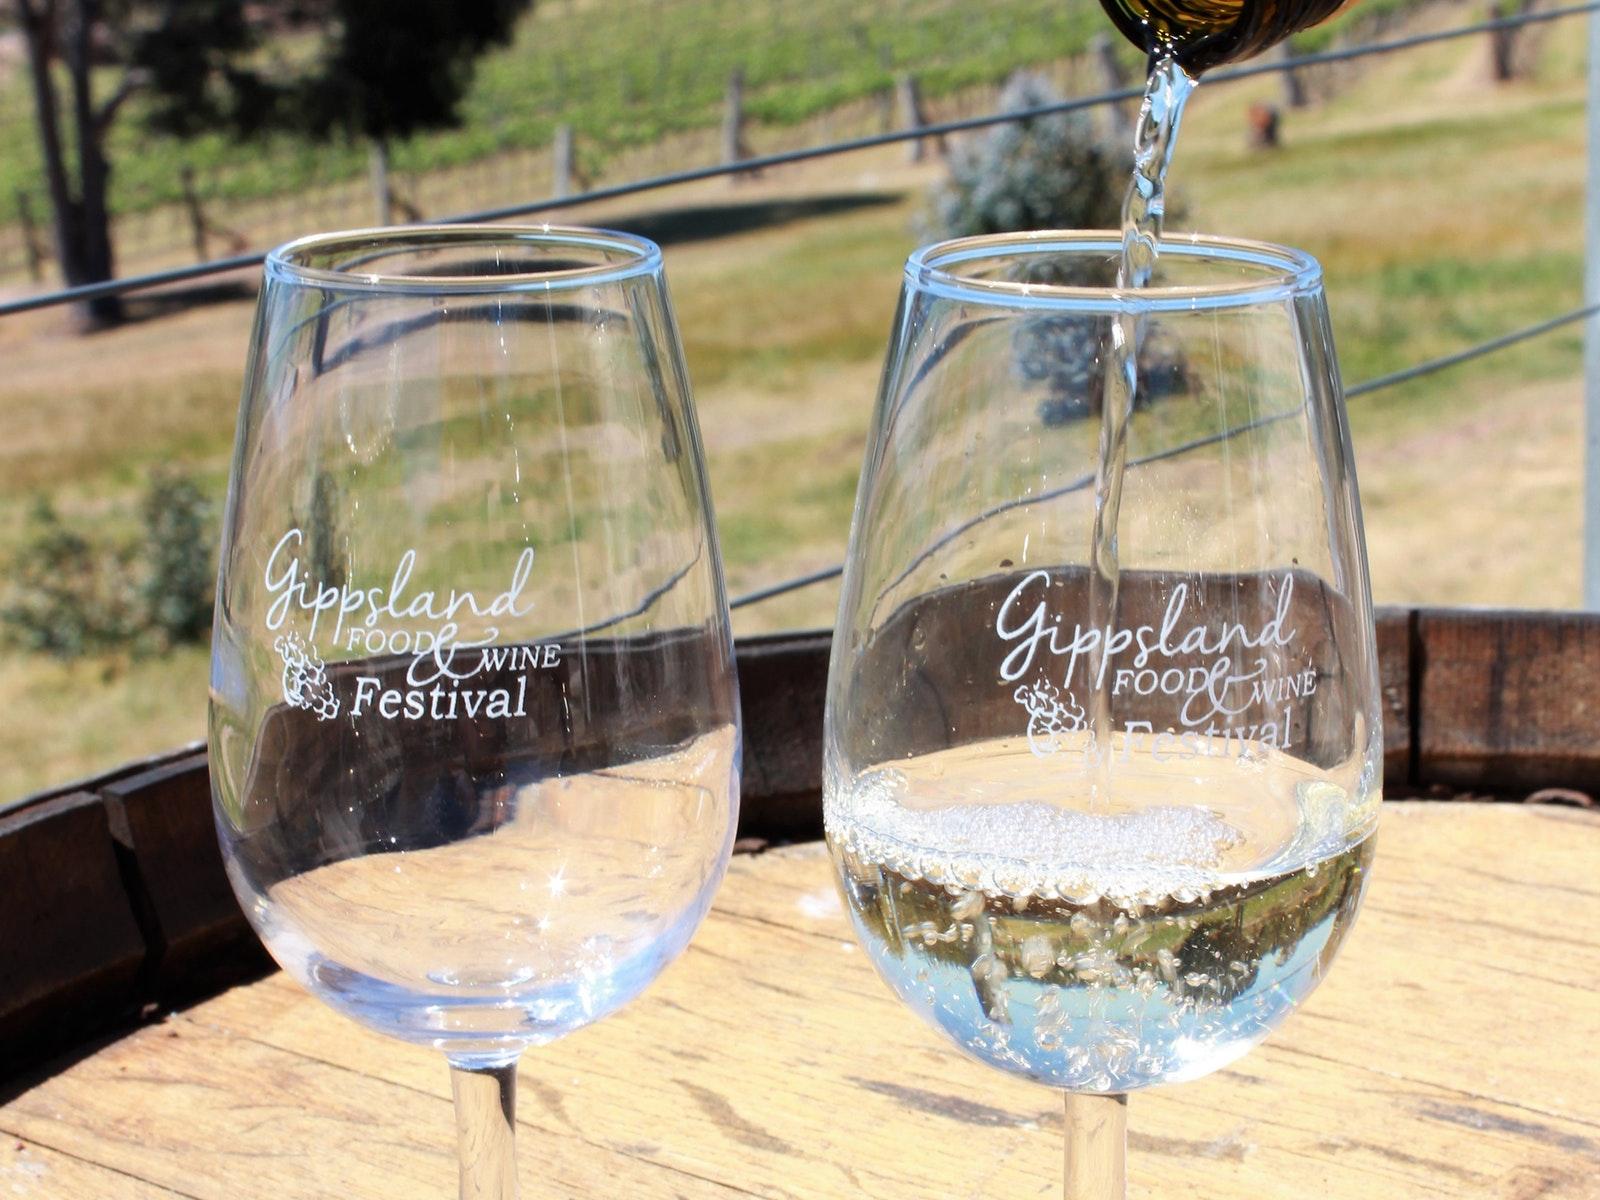 Gippsland Food and Wine Festival